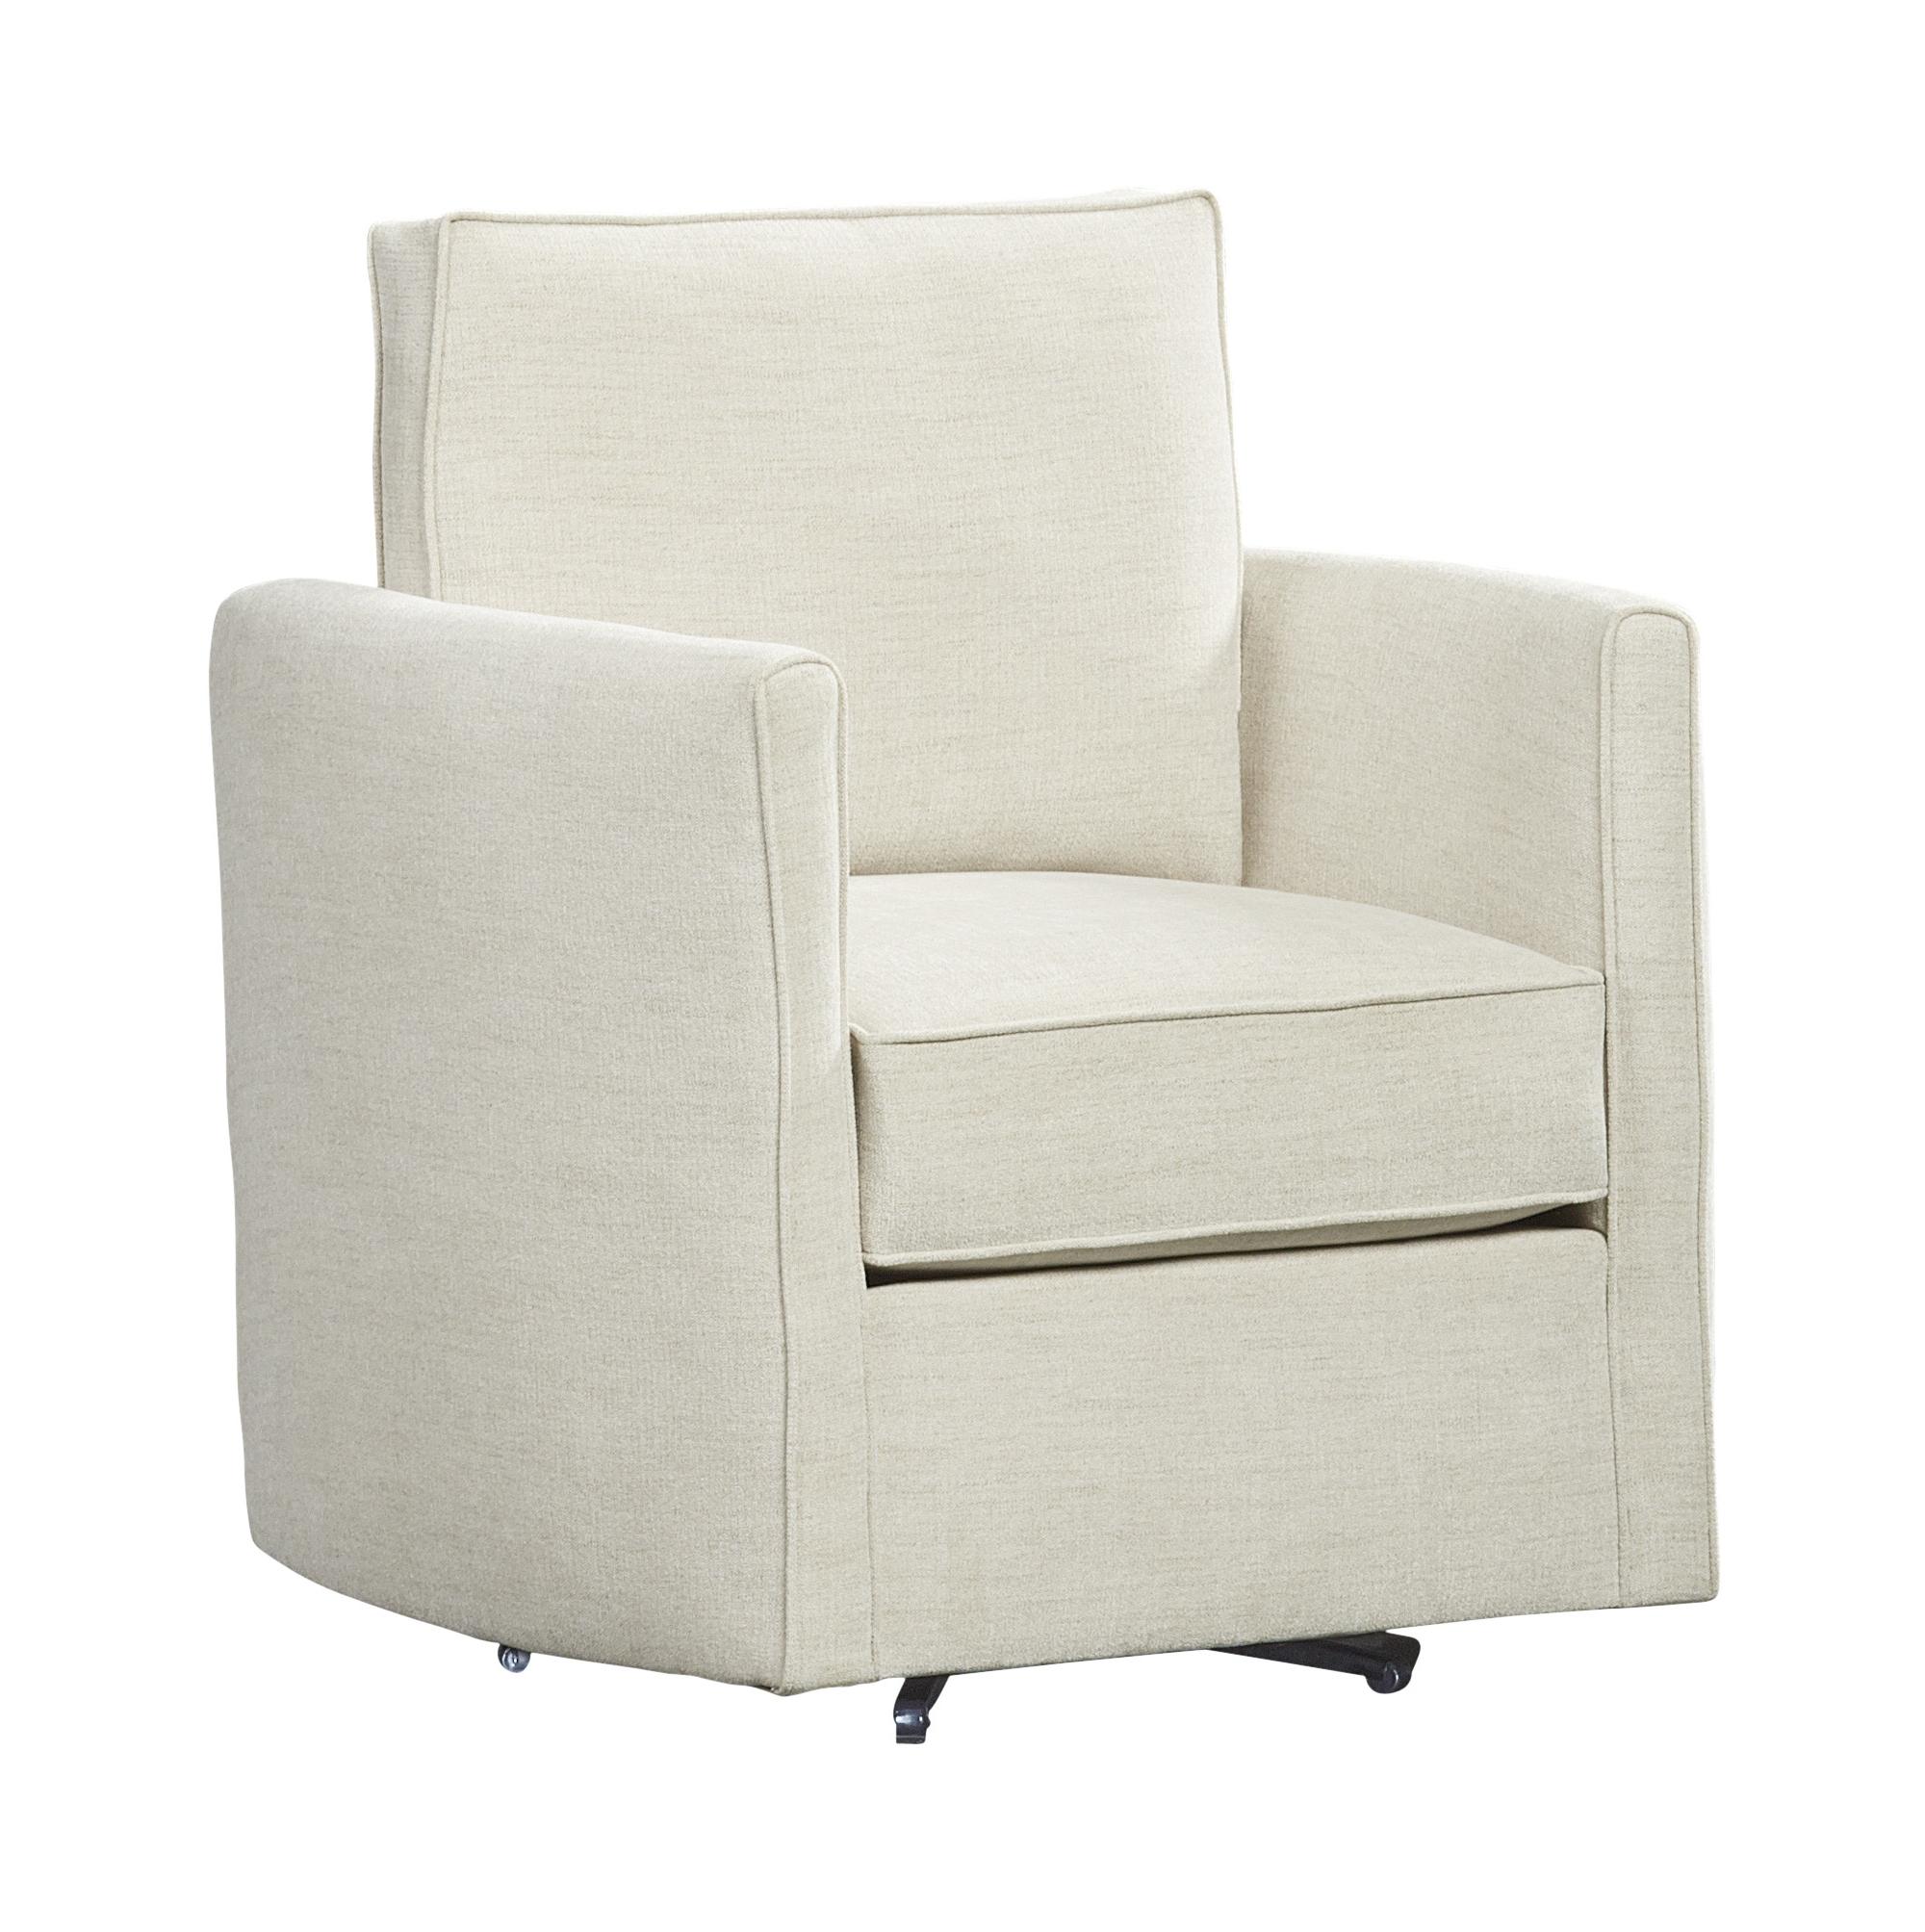 Corey Swivel Chair